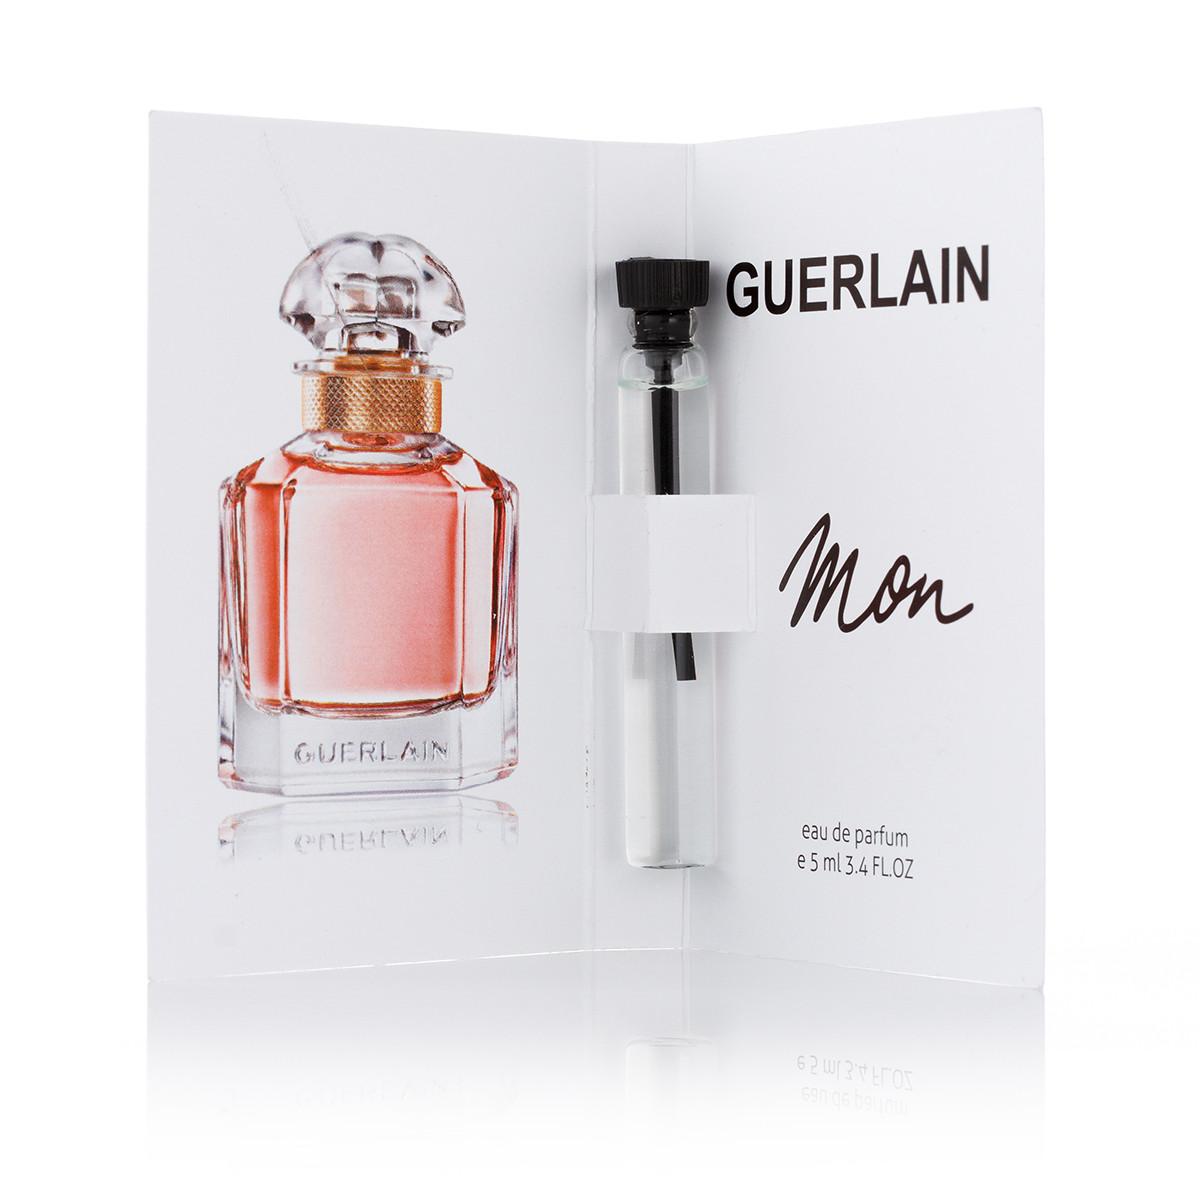 Пробник женский Guerlain Mon Guerlain ( Гюрлен Мон Гюрлен) 5 мл